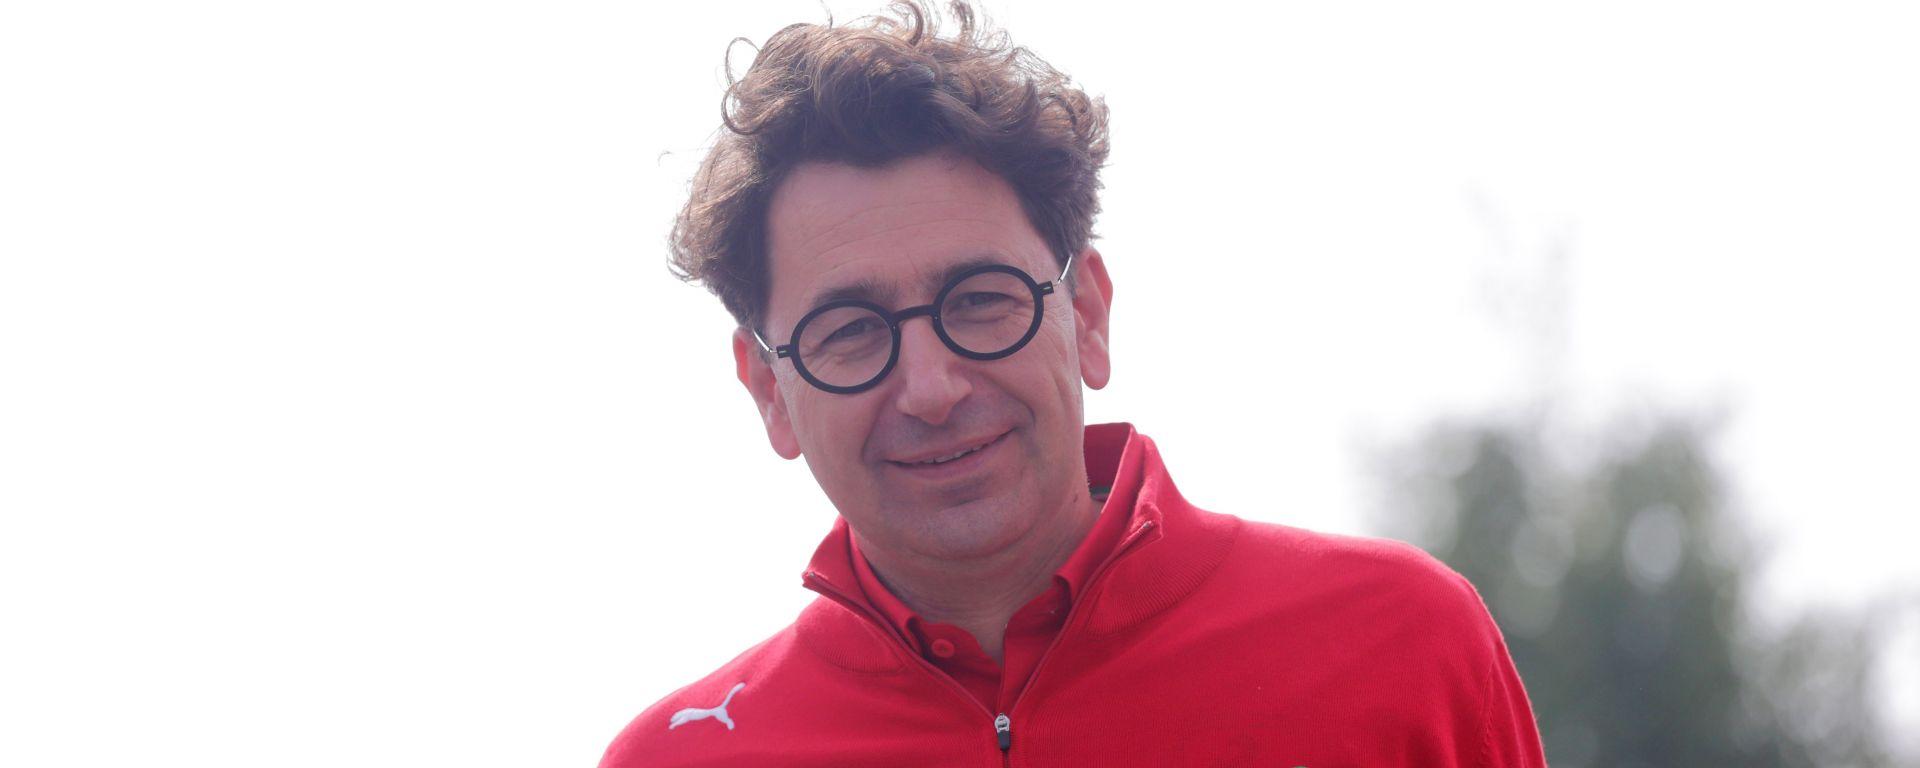 Mattia Binotto (Ferrari) sorridente a Spa